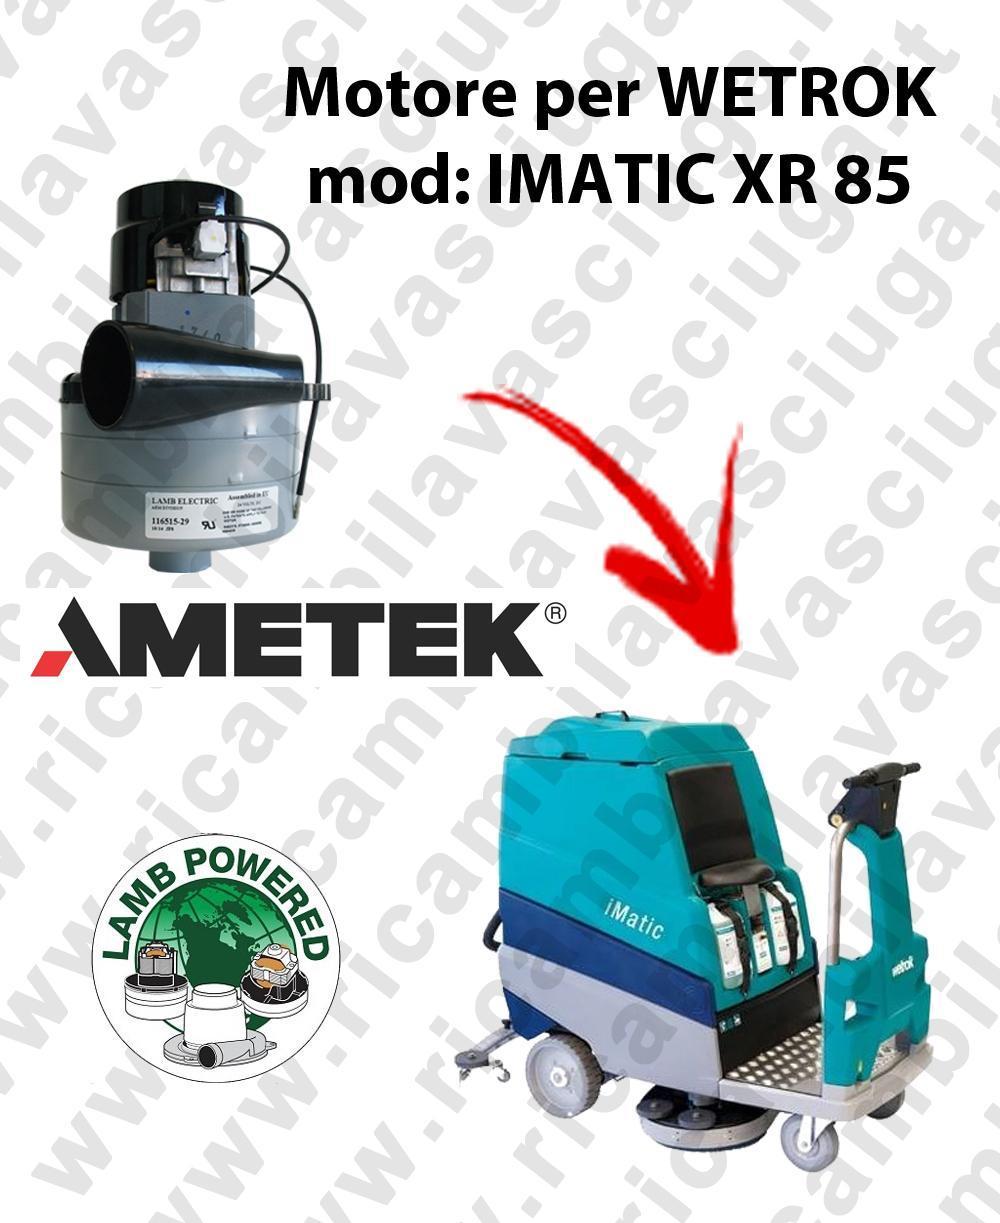 IMATIC XR 85 Saugmotor LAMB AMETEK für scheuersaugmaschinen WETROK